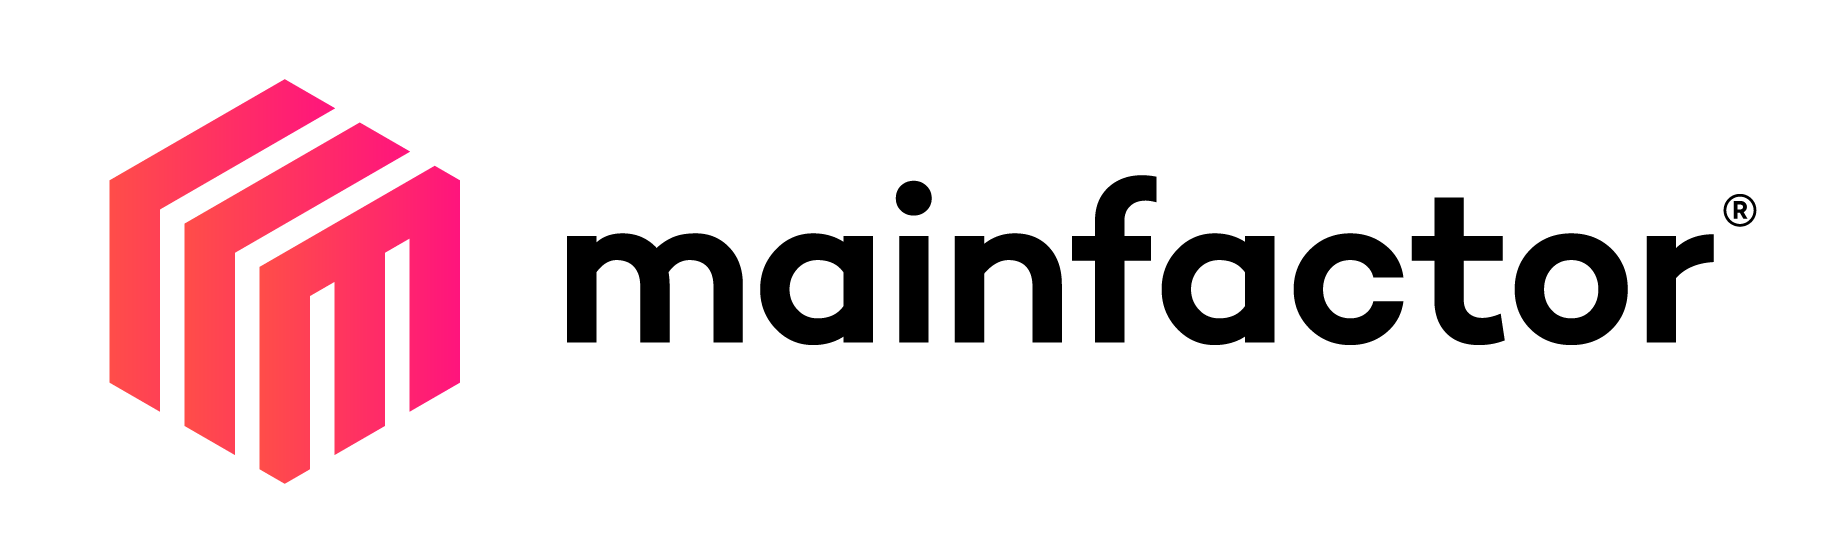 Mainfactor, Inc. header image